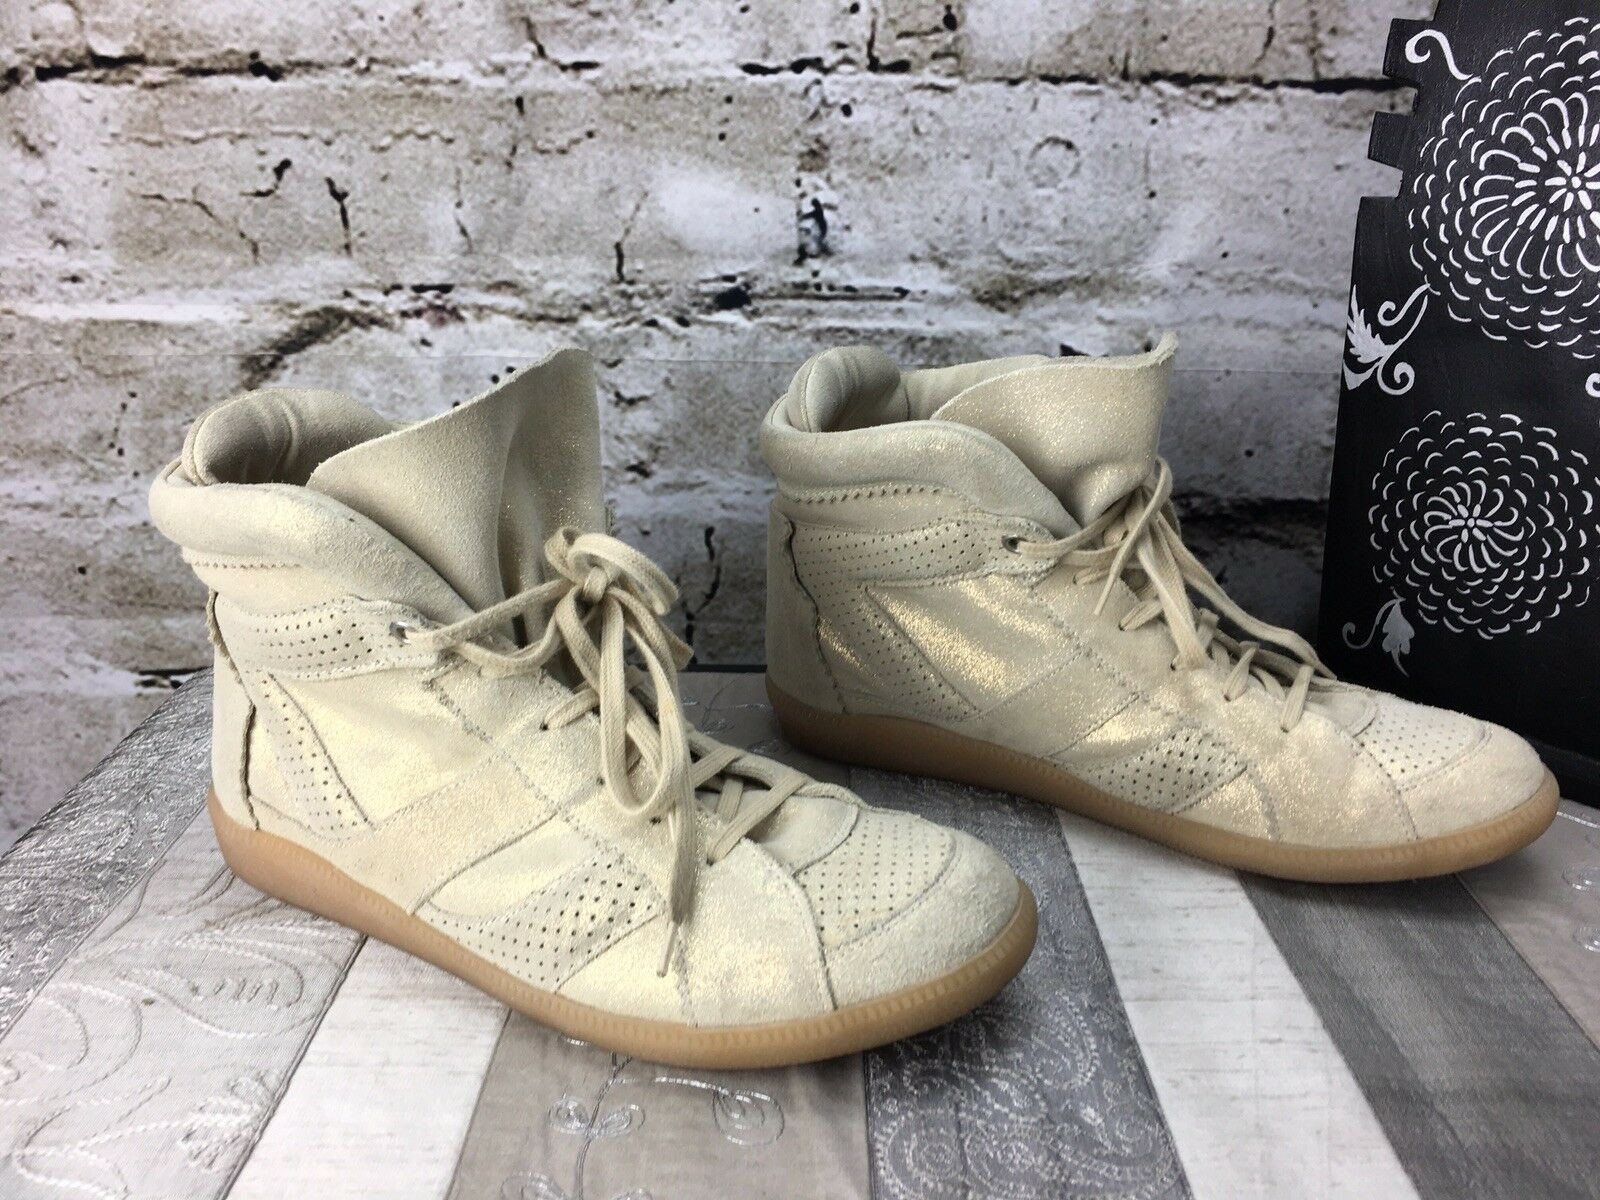 Zara Trafaluc 41 (US 9) Metallic Tan Glitter Suede Hi Top Leather Sneakers shoes